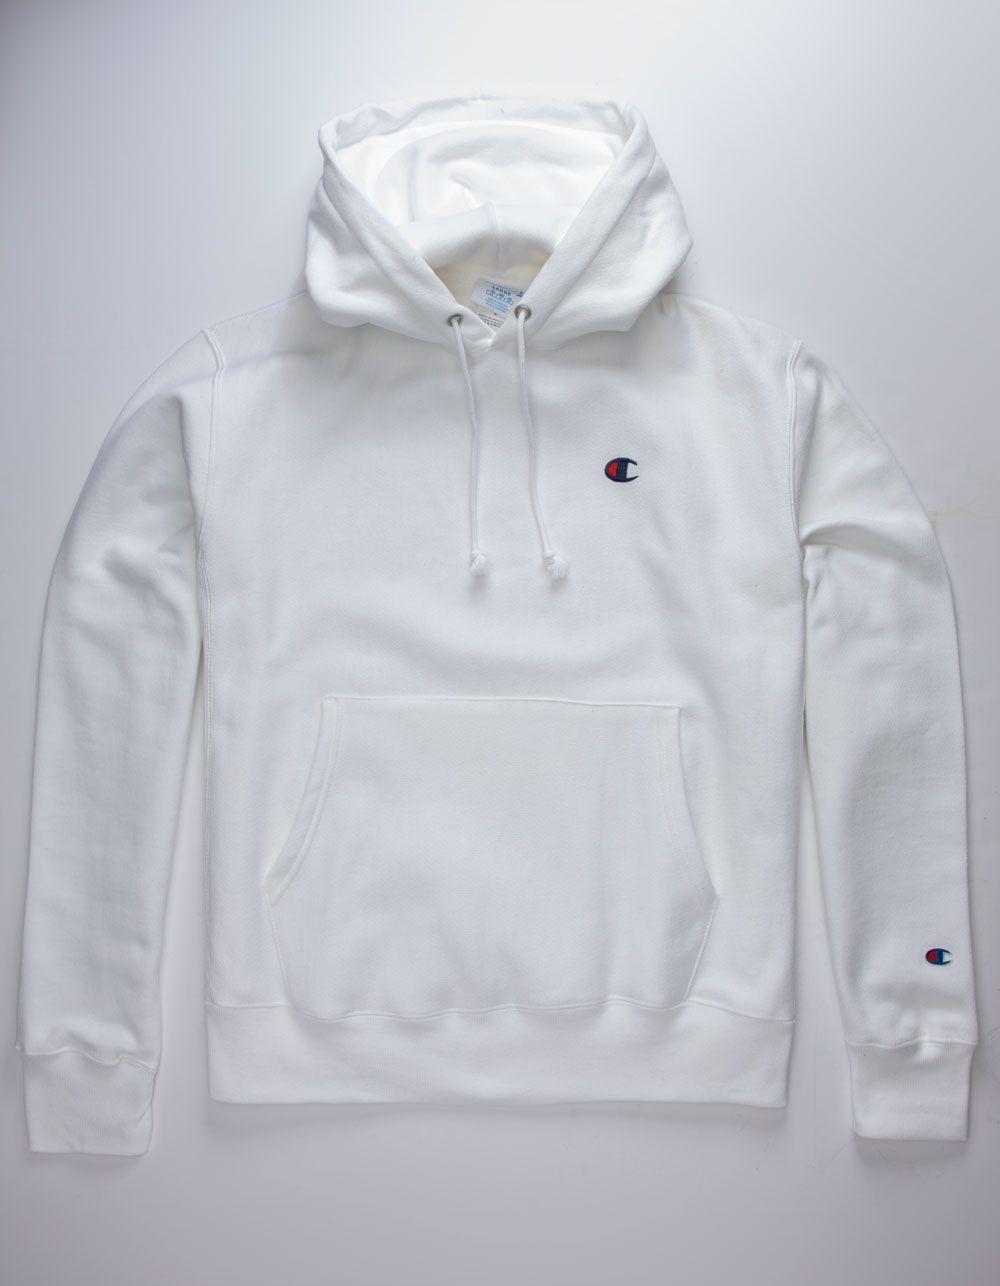 Champion Reverse Weave White Mens Hoodie White 335502150 White Hoodie Men Hoodies Champion Reverse Weave [ 1286 x 1000 Pixel ]